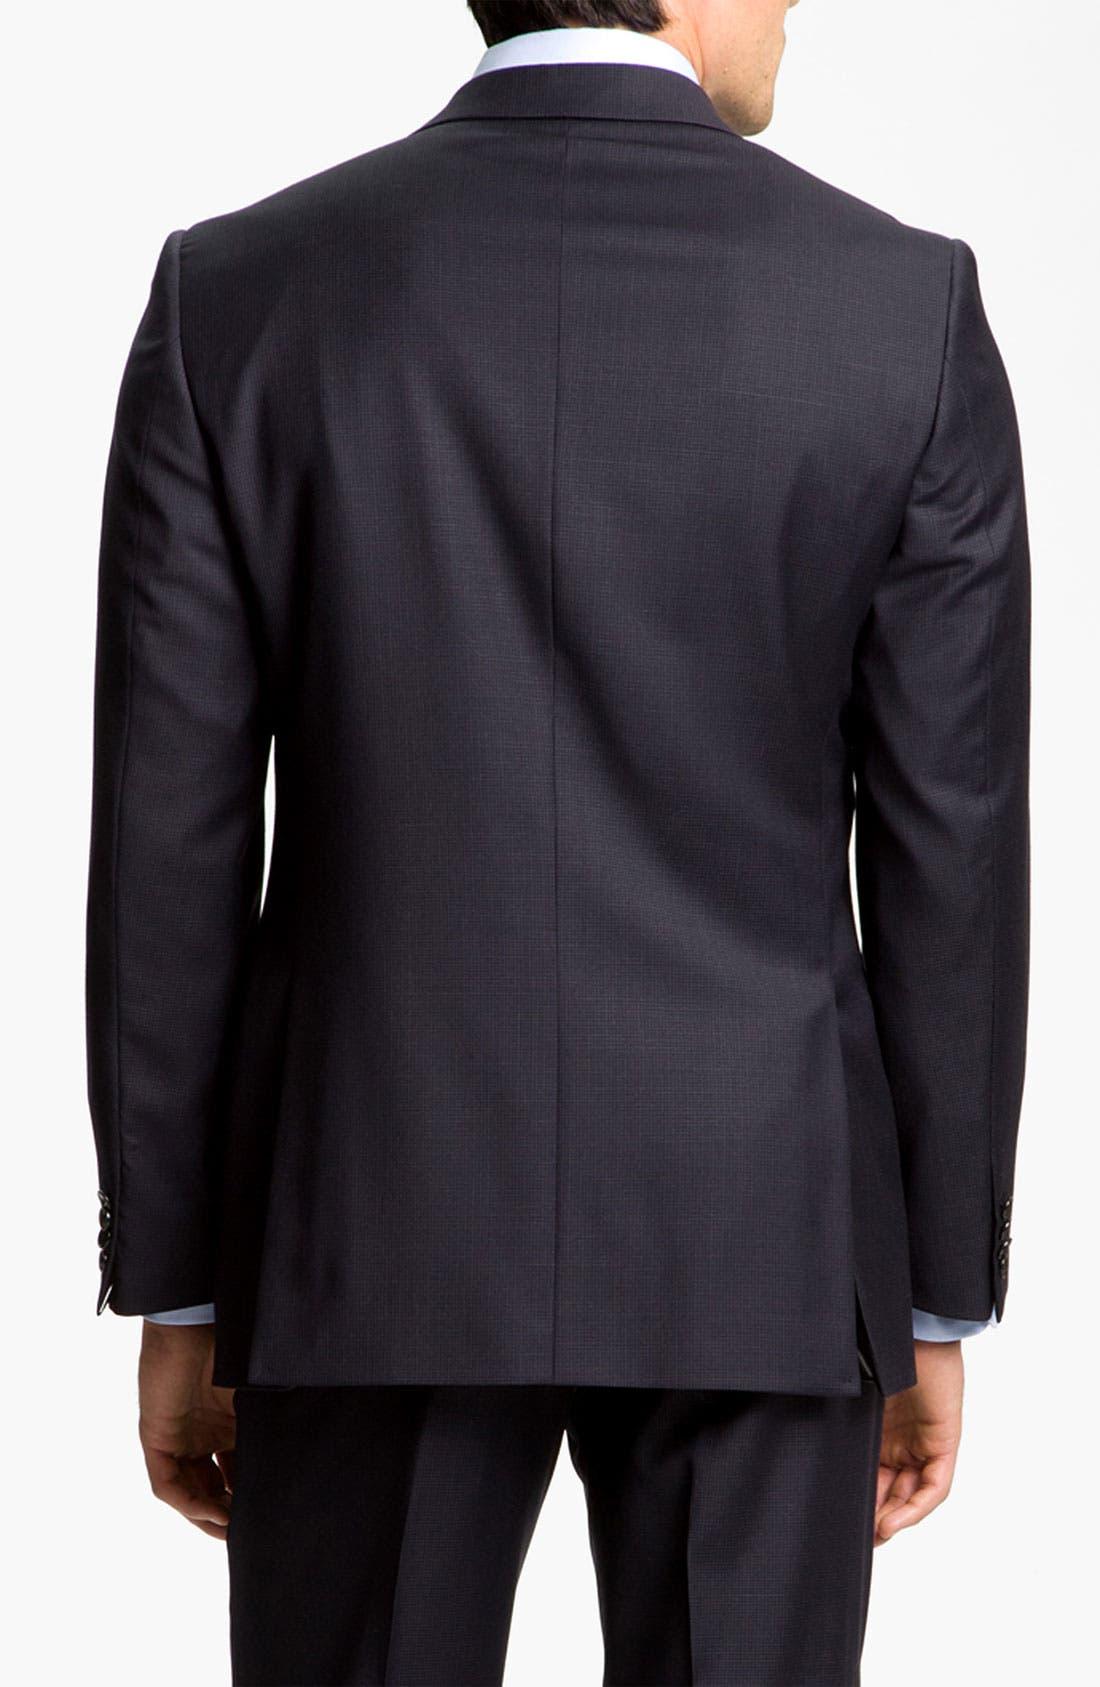 Alternate Image 2  - Joseph Abboud 'Profile Hybrid Signature' Wool Suit